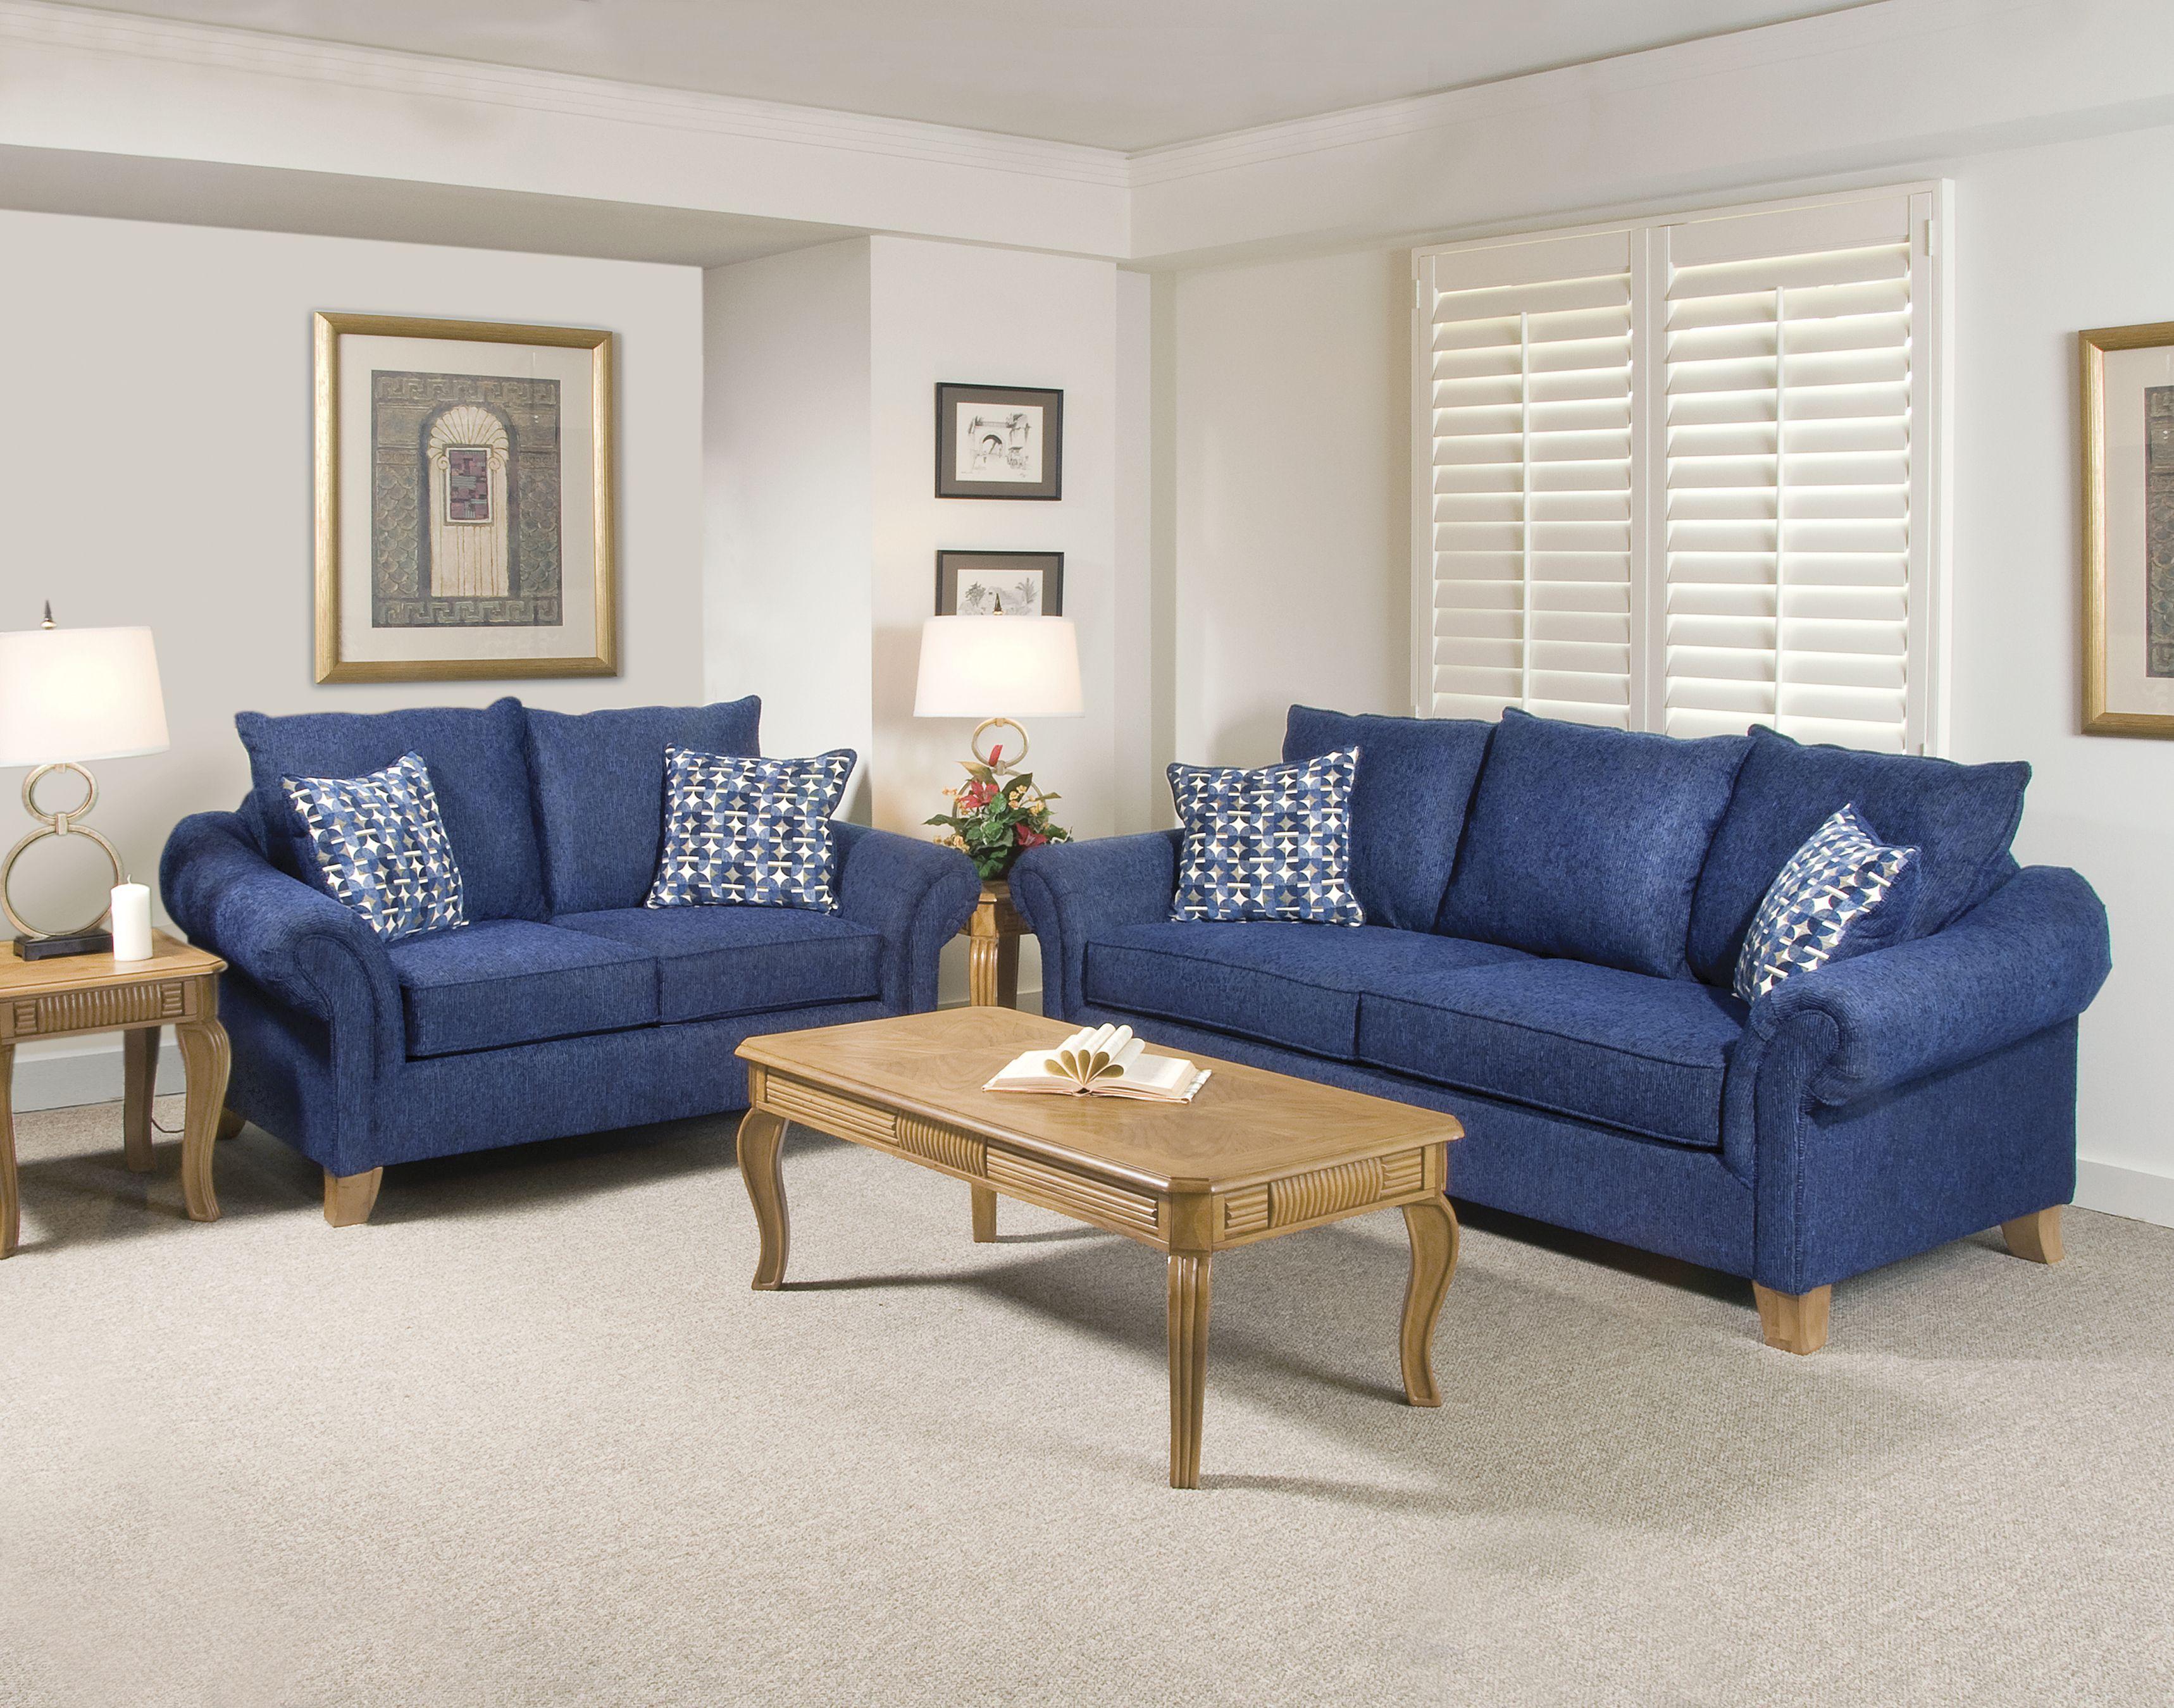 High Quality Affordable Living Room Sets. San Marino Ebony Sofa U0026amp Loveseat. Swaim Furniture  Furniture Charlotte Part 10